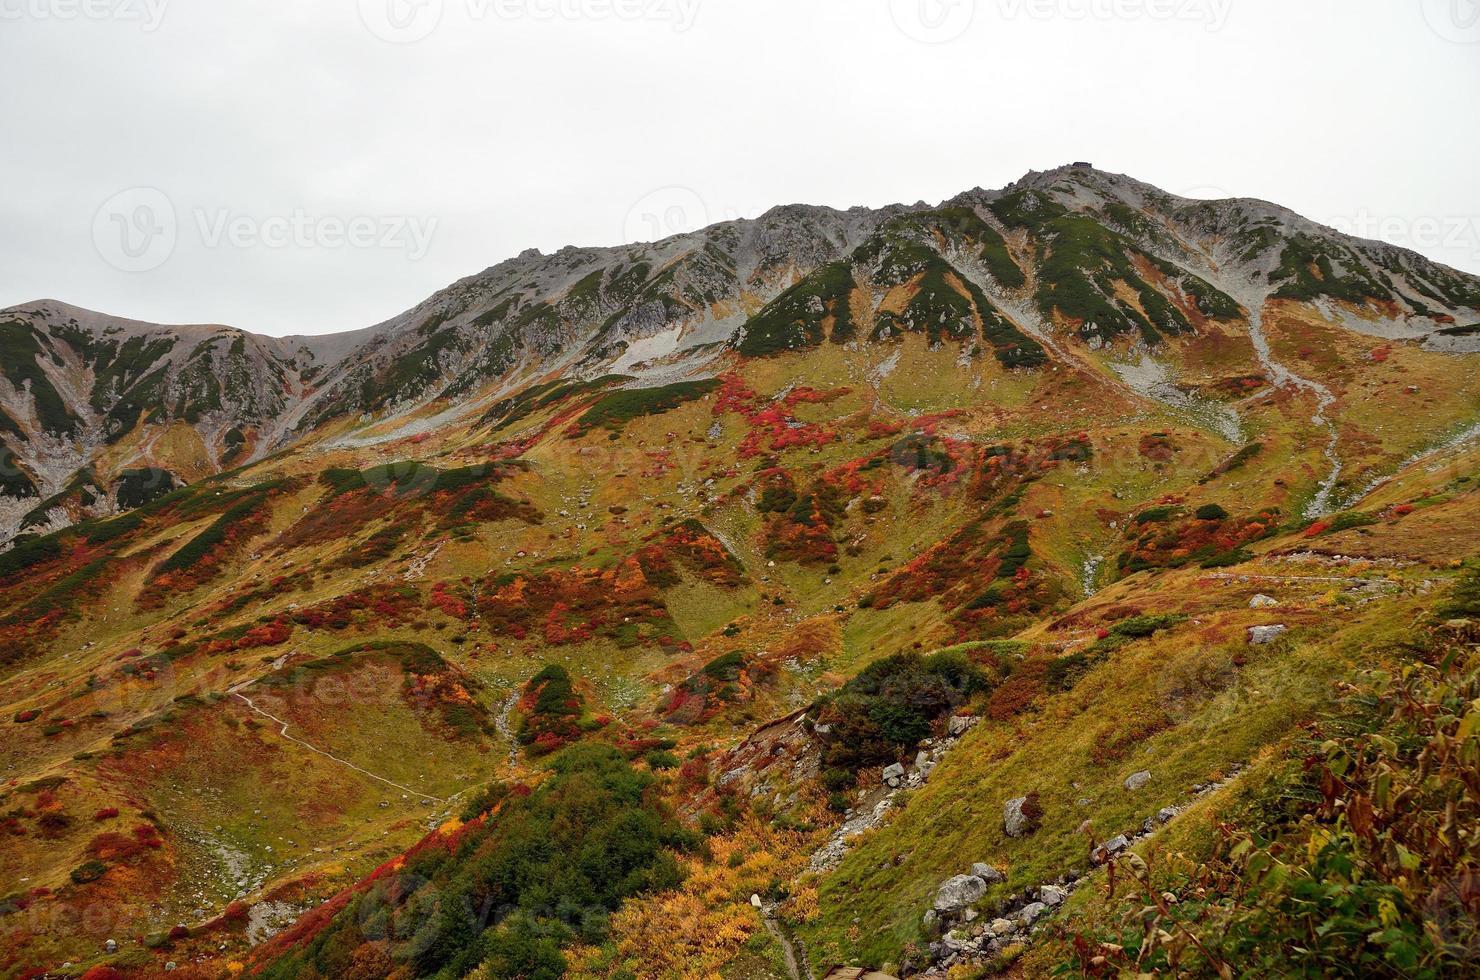 höstfärger, Tateyama bergskedja, Japan foto